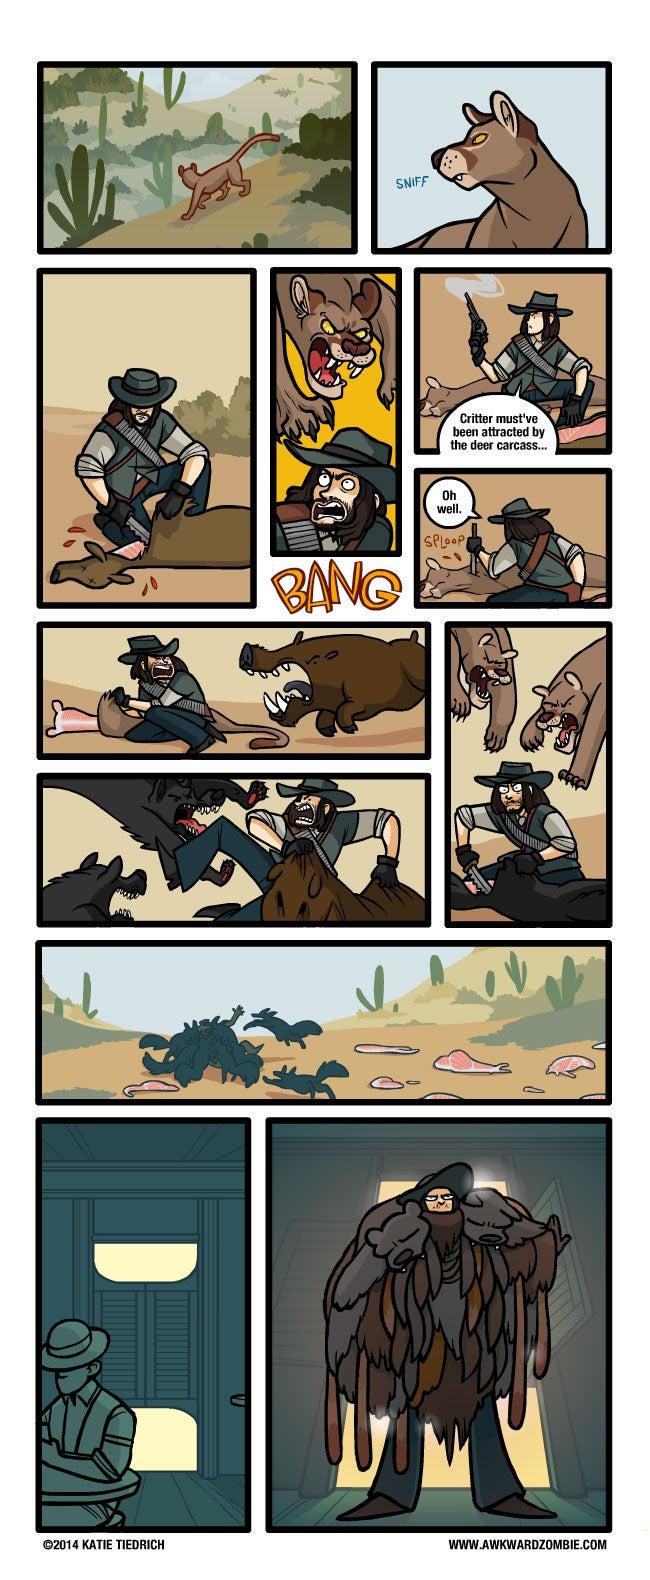 Sunday Comics: The Goat Hurler